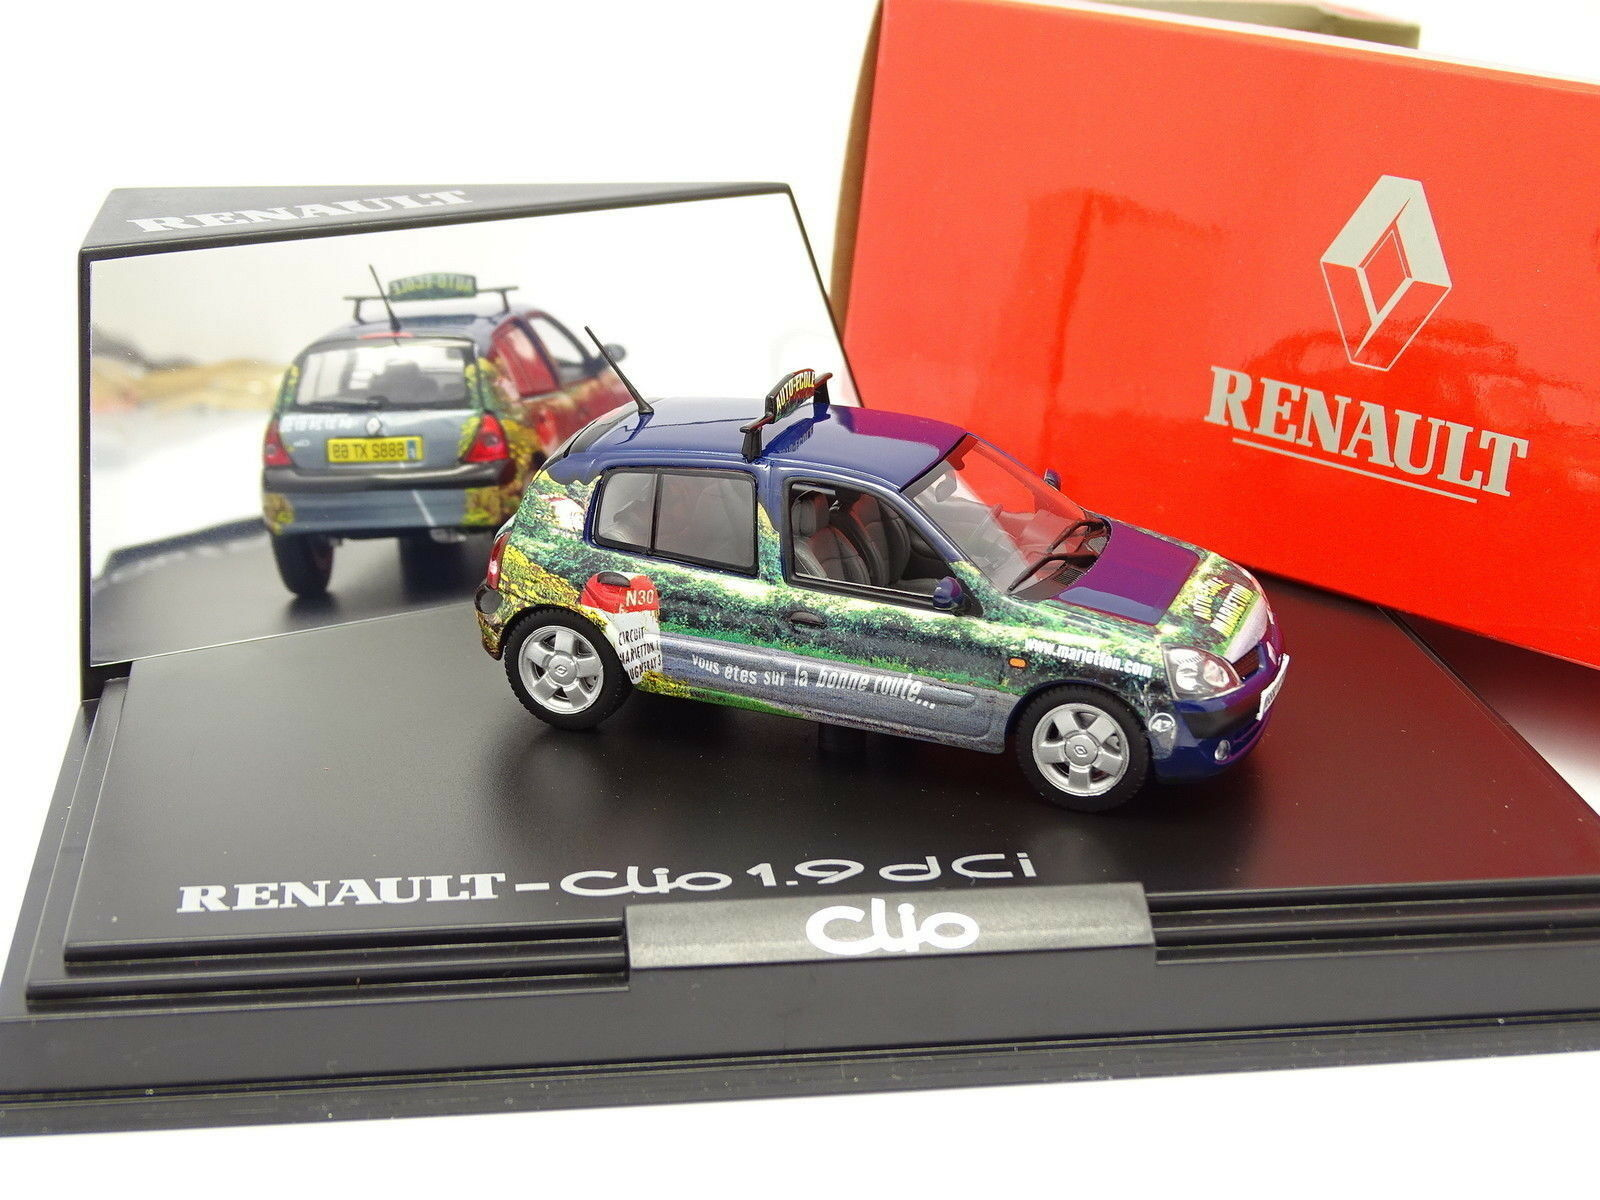 Norev 1 43 - Renault Clio 1.9 DCI Auto Ecole